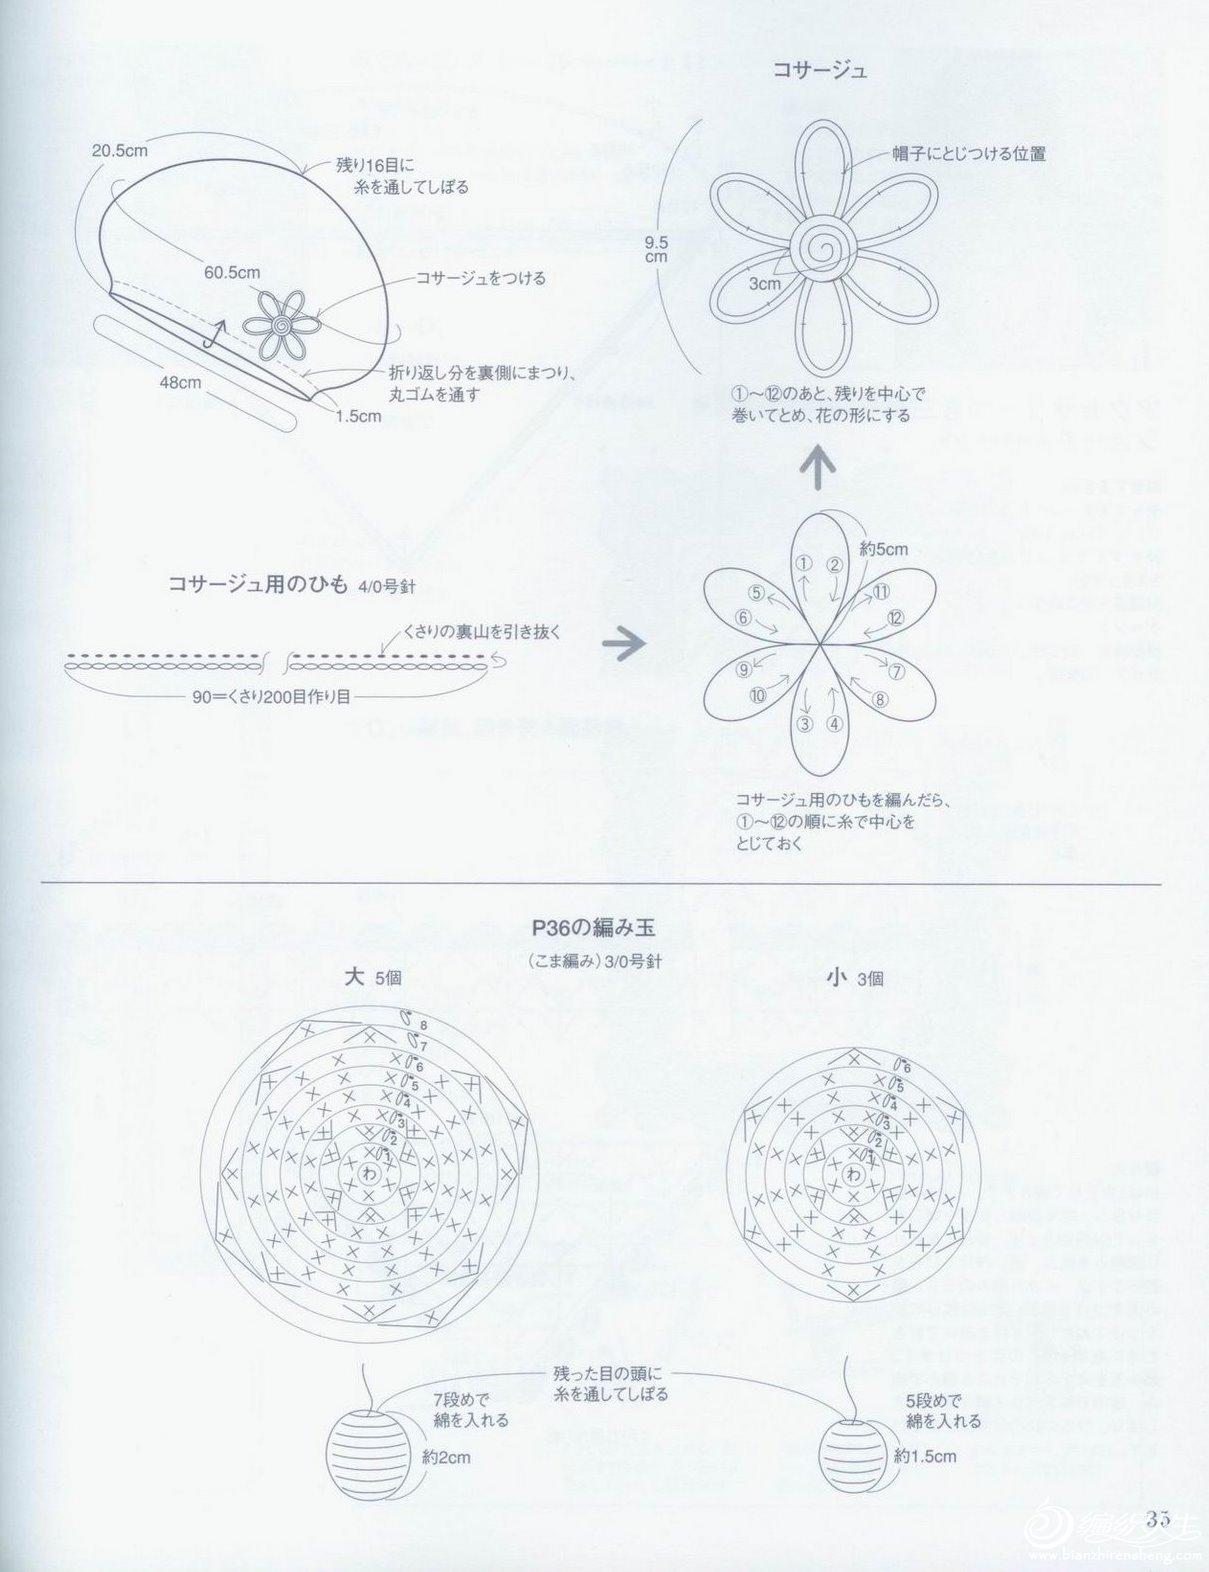 h035.jpg